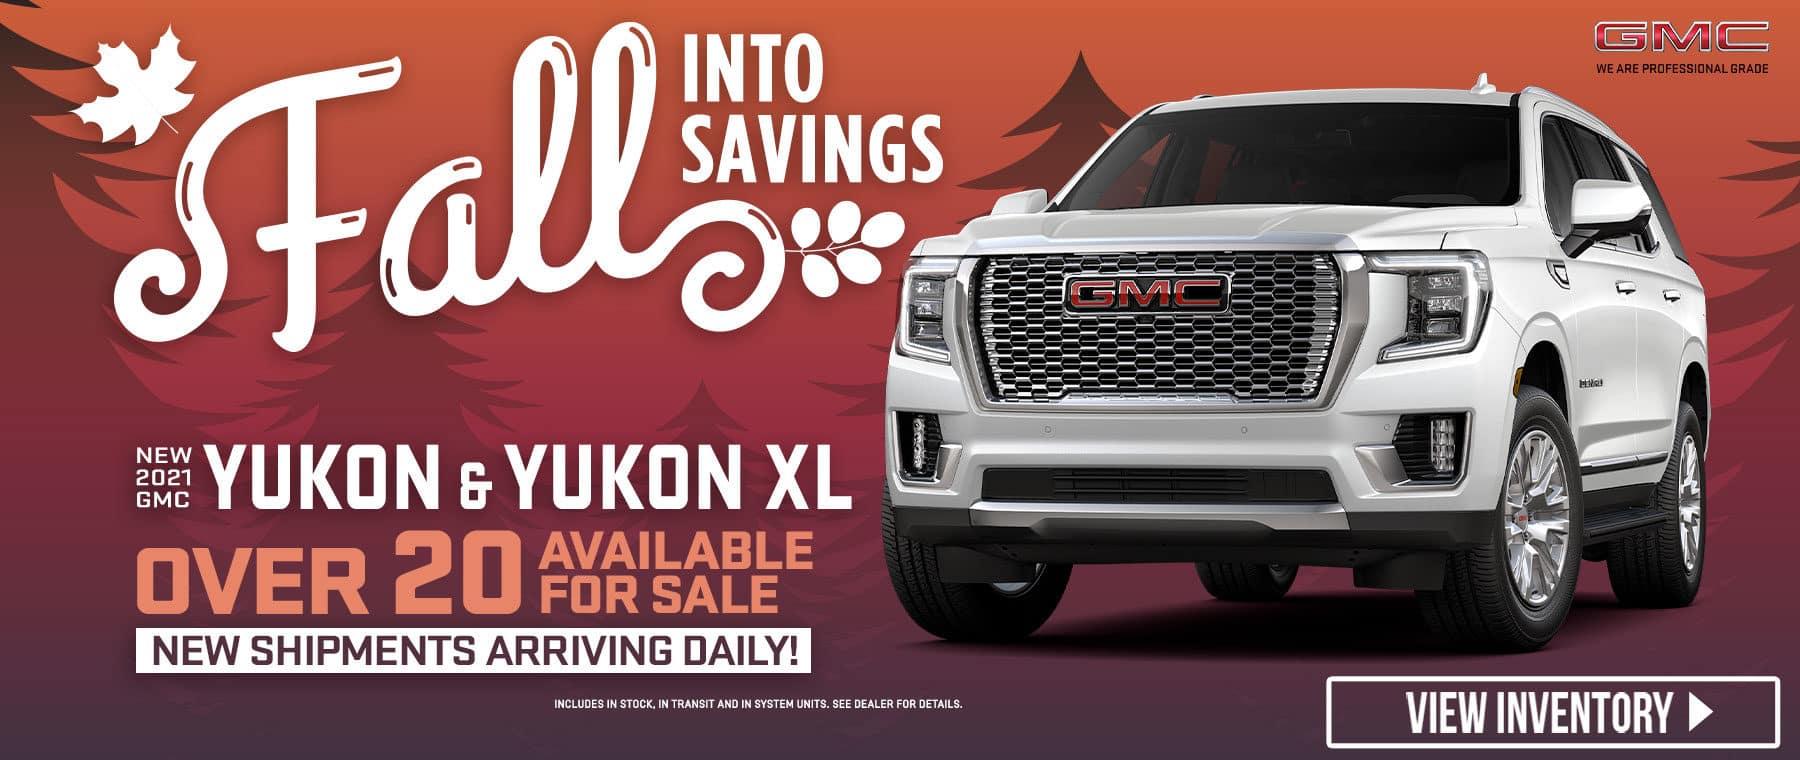 New 2021 GMC Yukon & Yukon XL - Over 20 Available